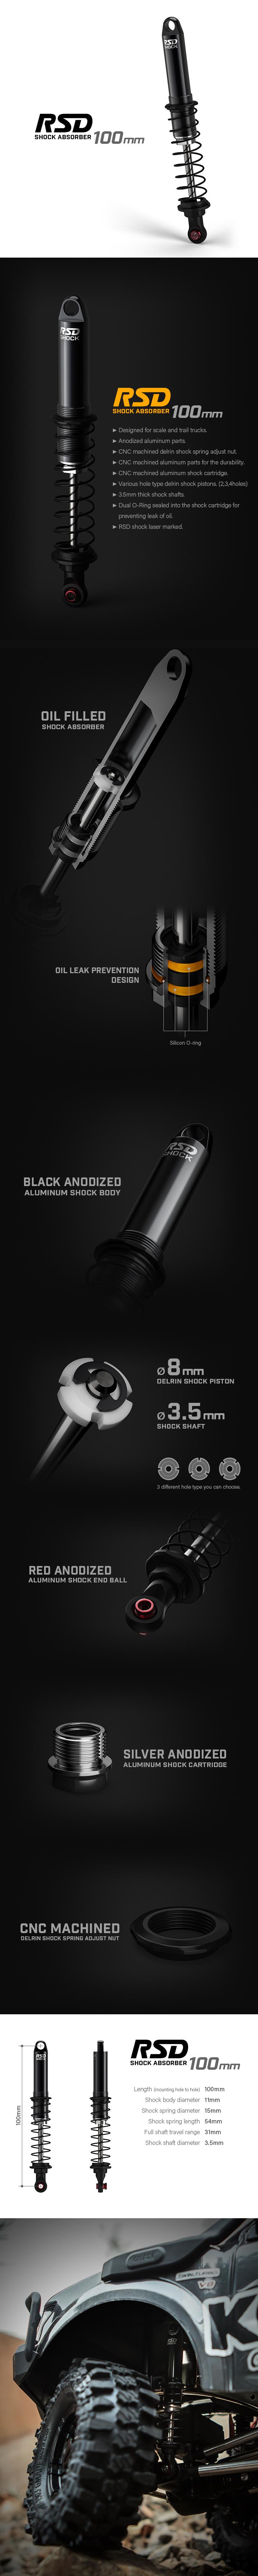 gm23404 Gmade RSD Shock 100mm (2) GM23404